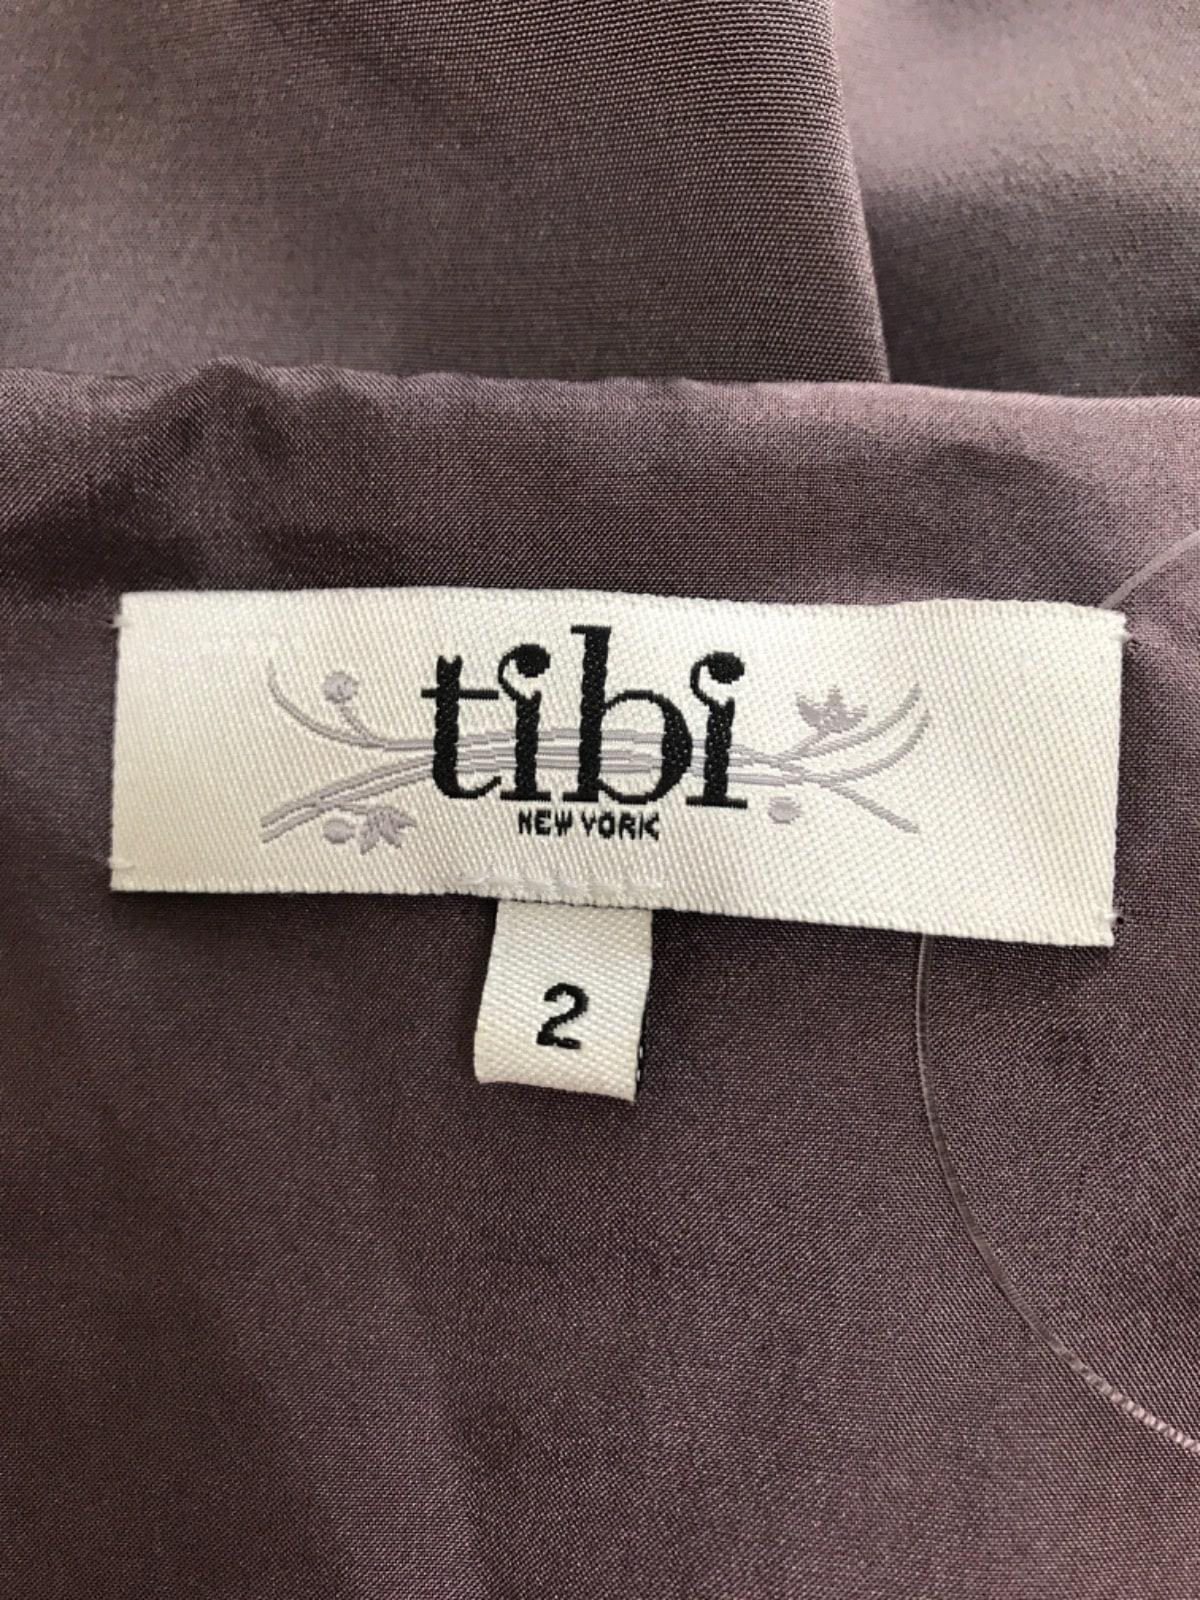 tibi(ティビ)のカットソー